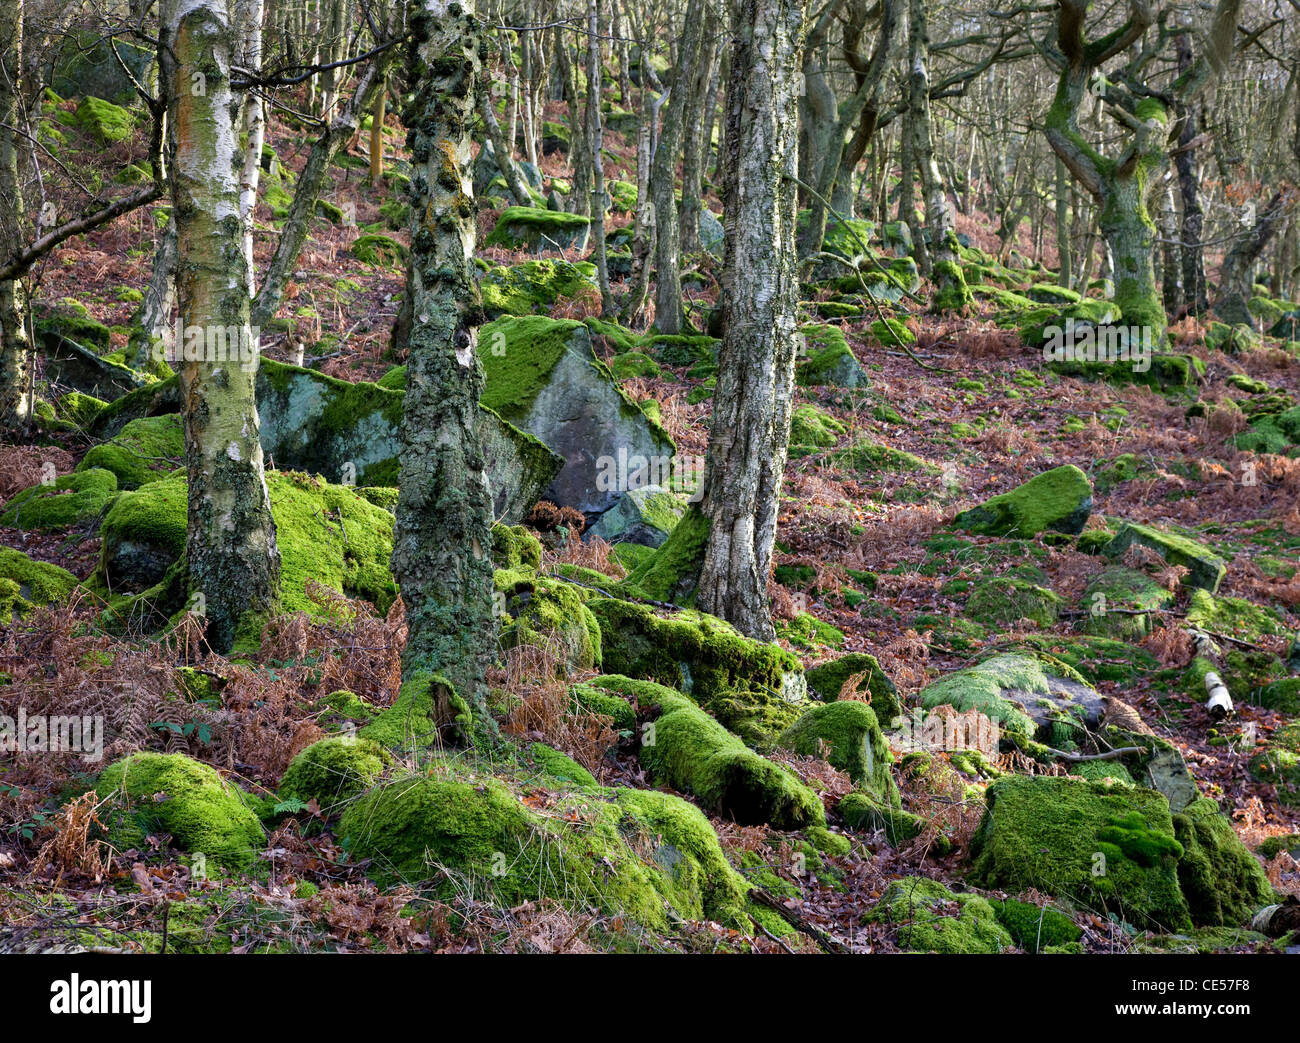 Birch woodland on steep rocky slopes below Froggatt Edge near Baslow in the Derbyshire Peak district - Stock Image